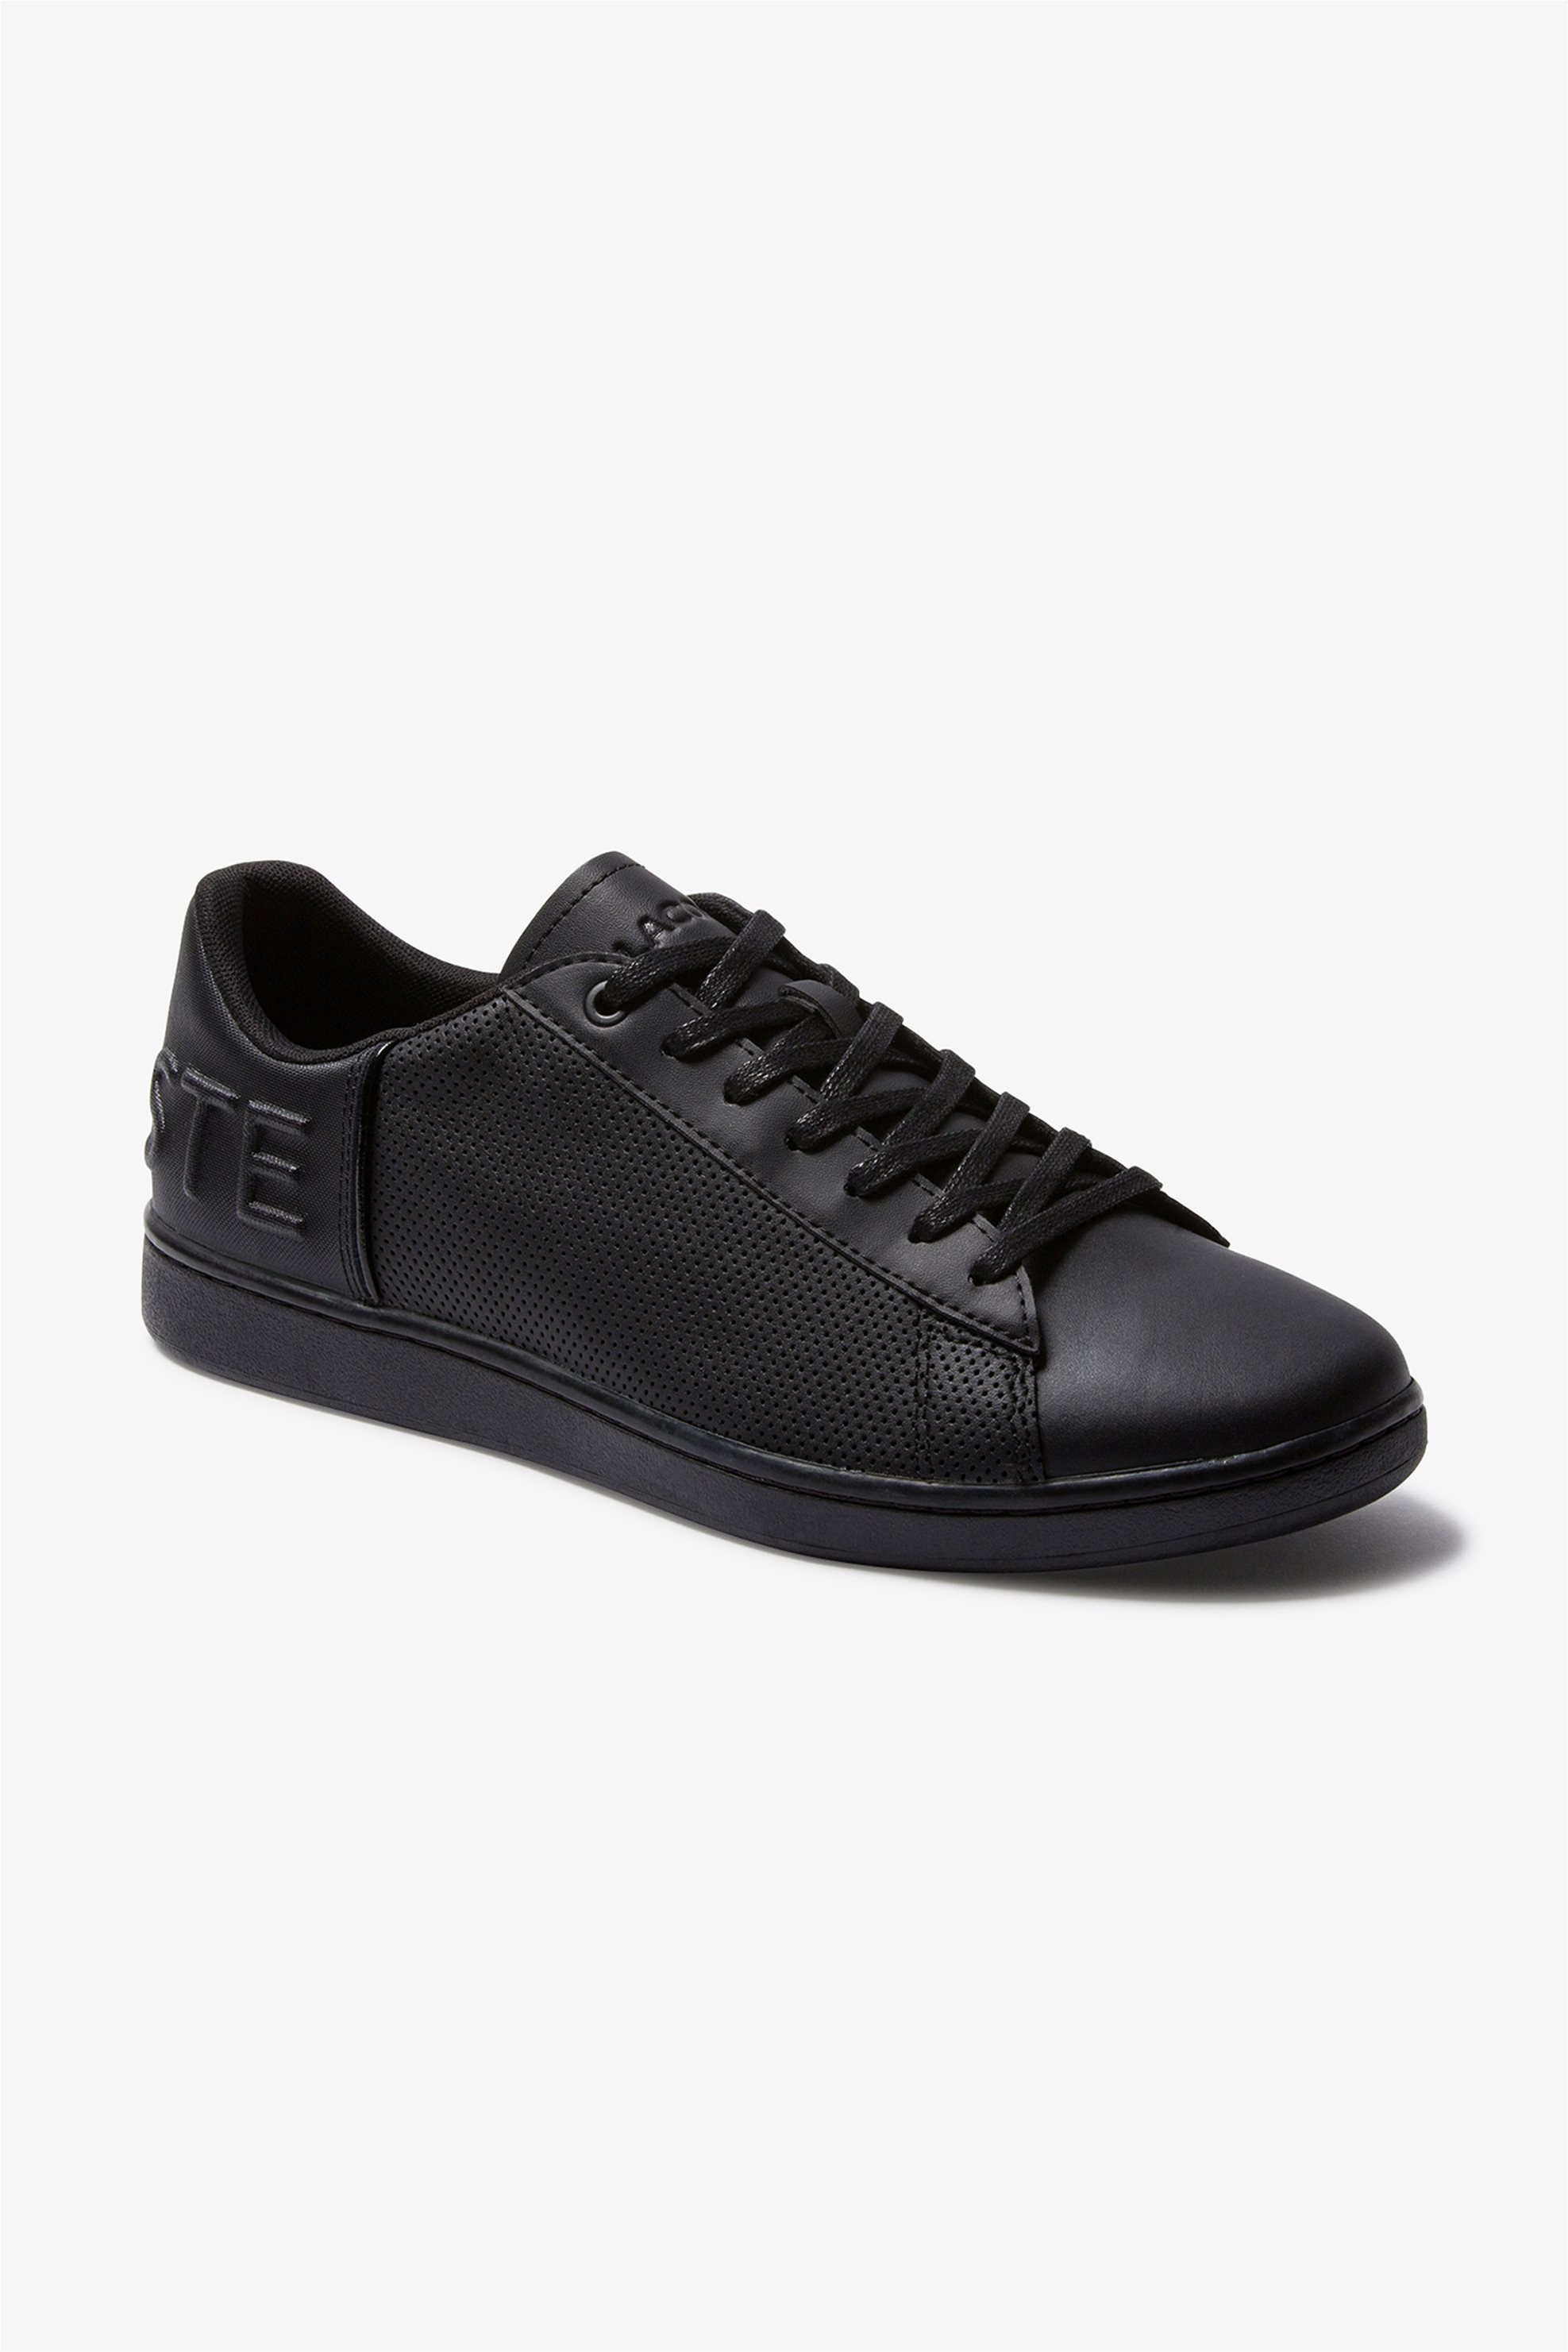 "Lacoste ανδρικά sneakers με μεγάλο λογότυπο ""Carnaby Evo 120"" – 39SMA000202H – Μαύρο"